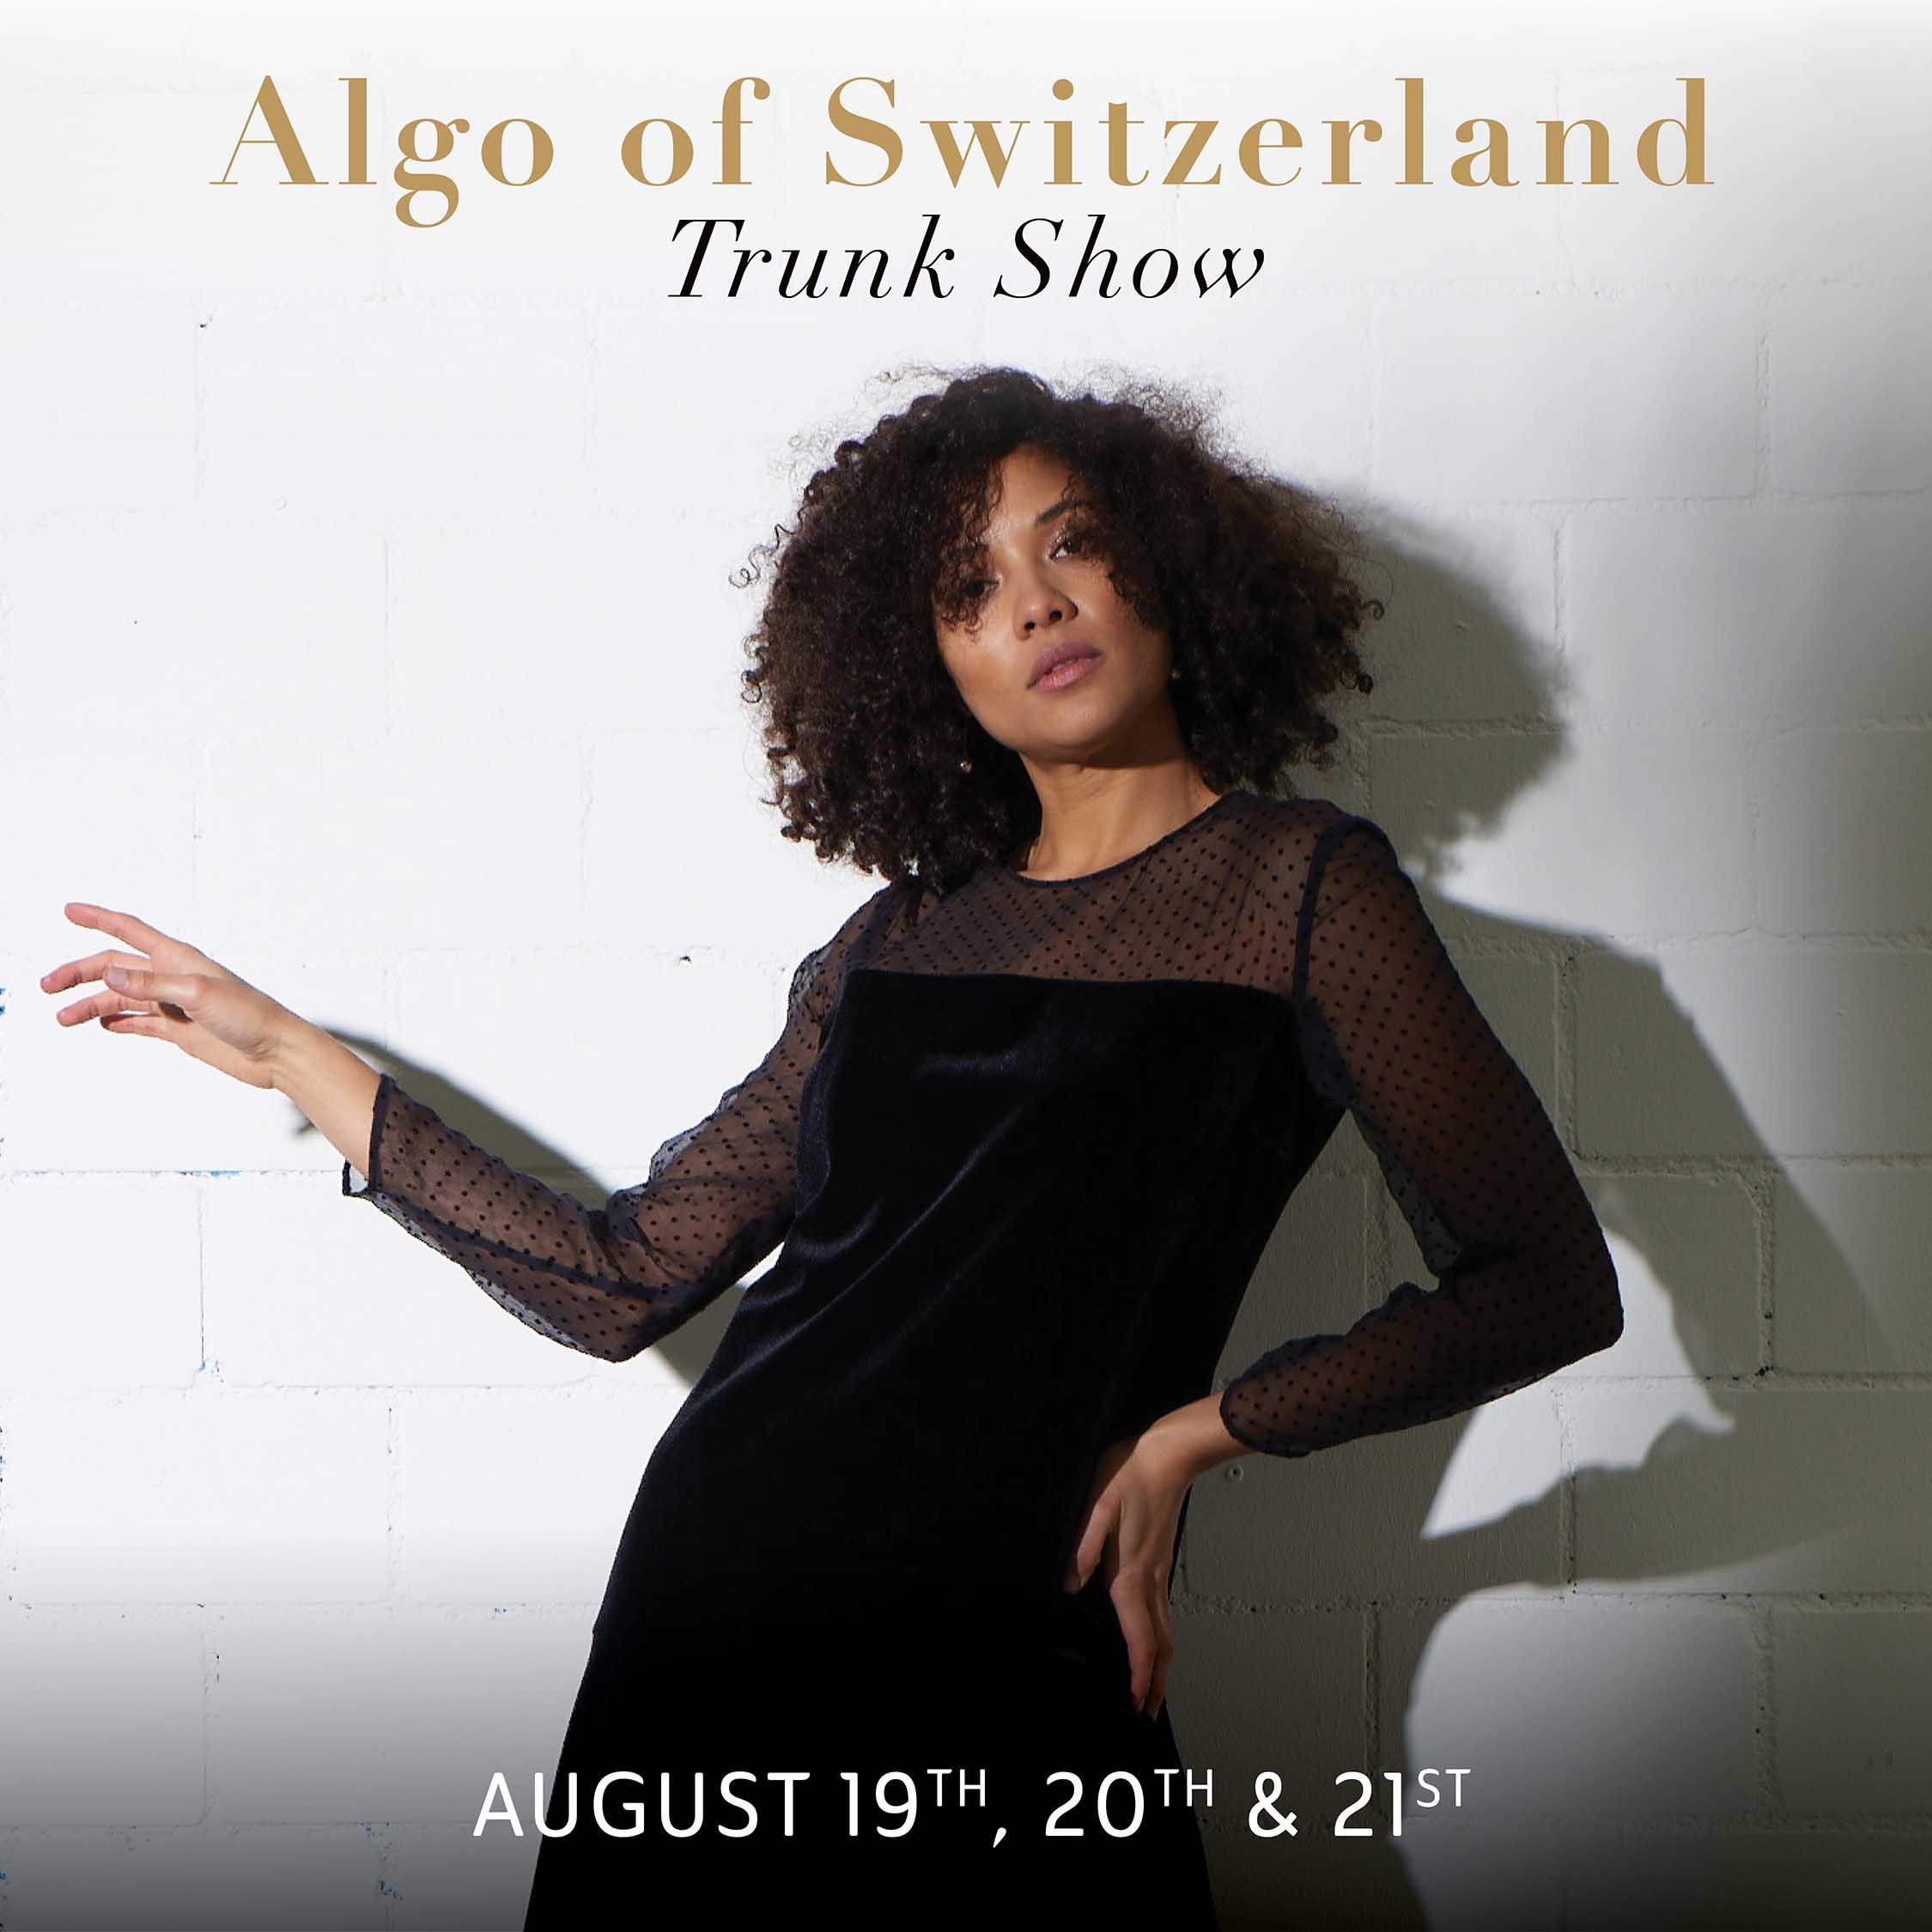 ALGO of Switzerland Trunk Show